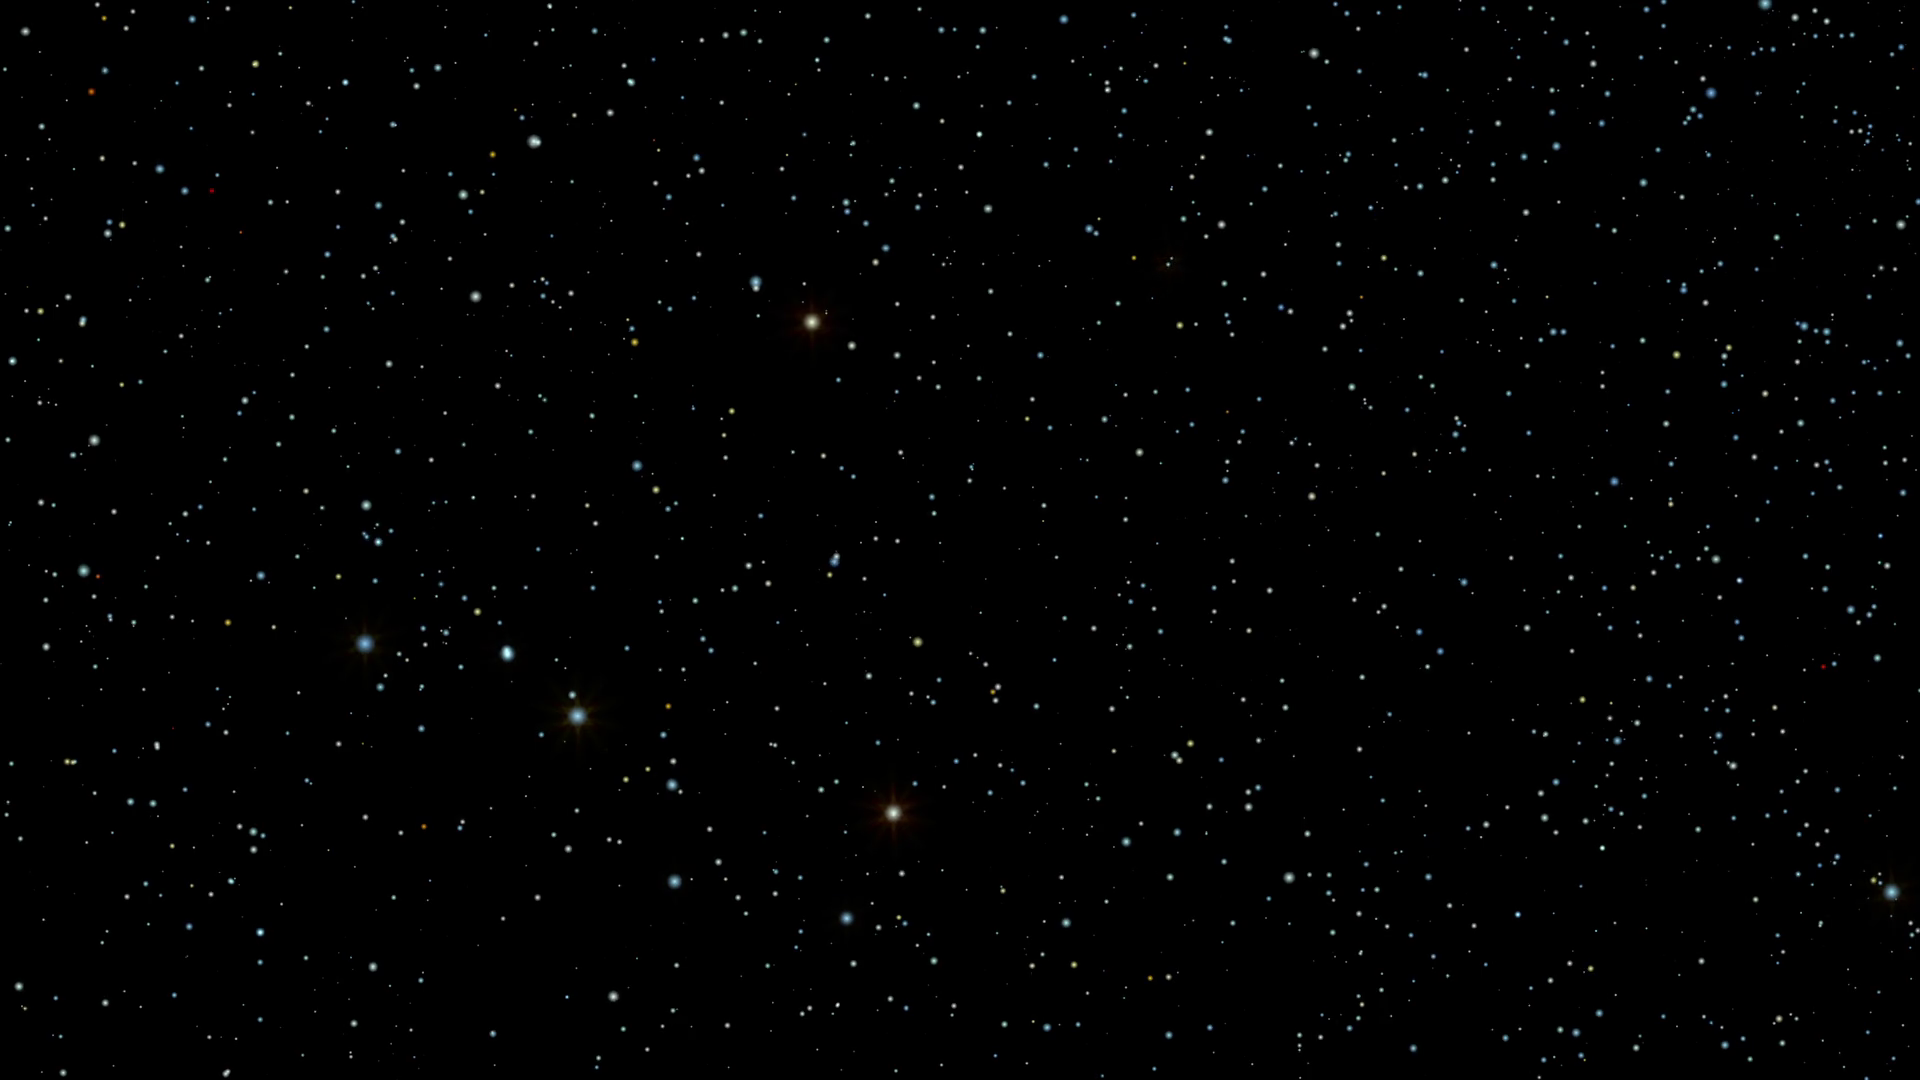 night-sky-005-a-star-field-twinkles-in-a-night-sky-loop_hf3owvebl_thumbnail-full01